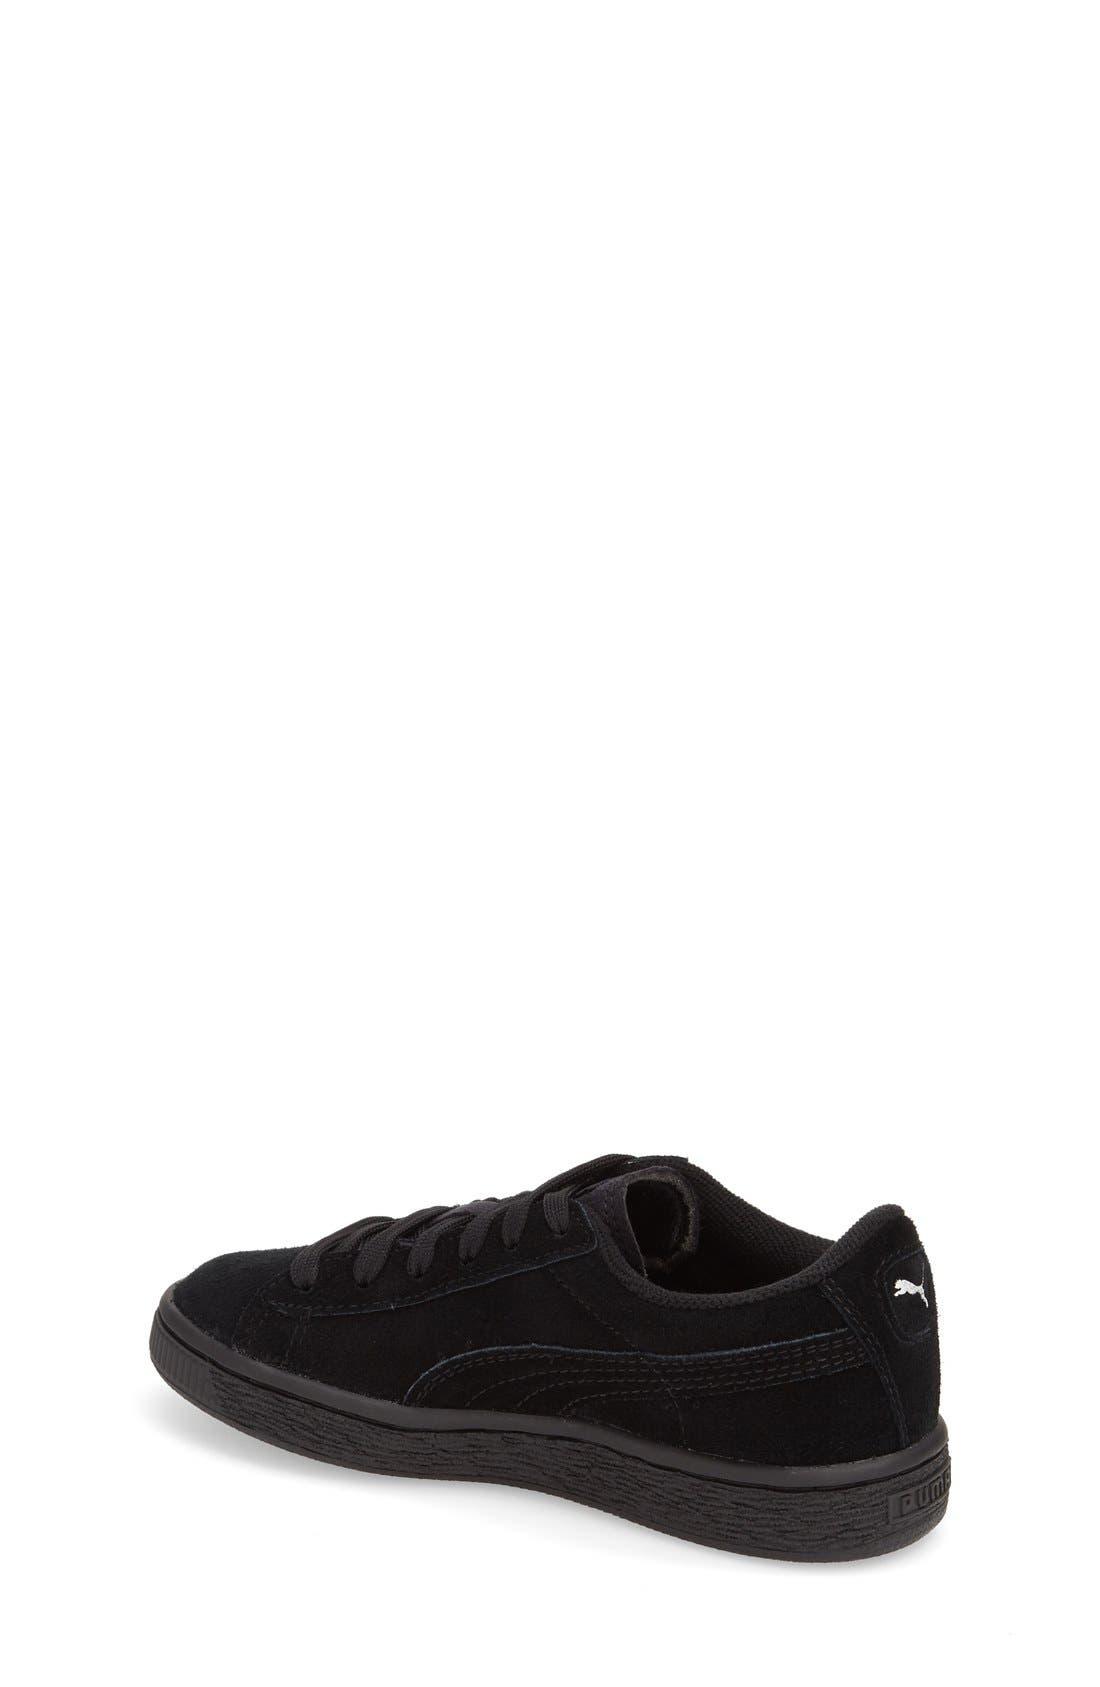 'Suede'Sneaker,                             Alternate thumbnail 4, color,                             001